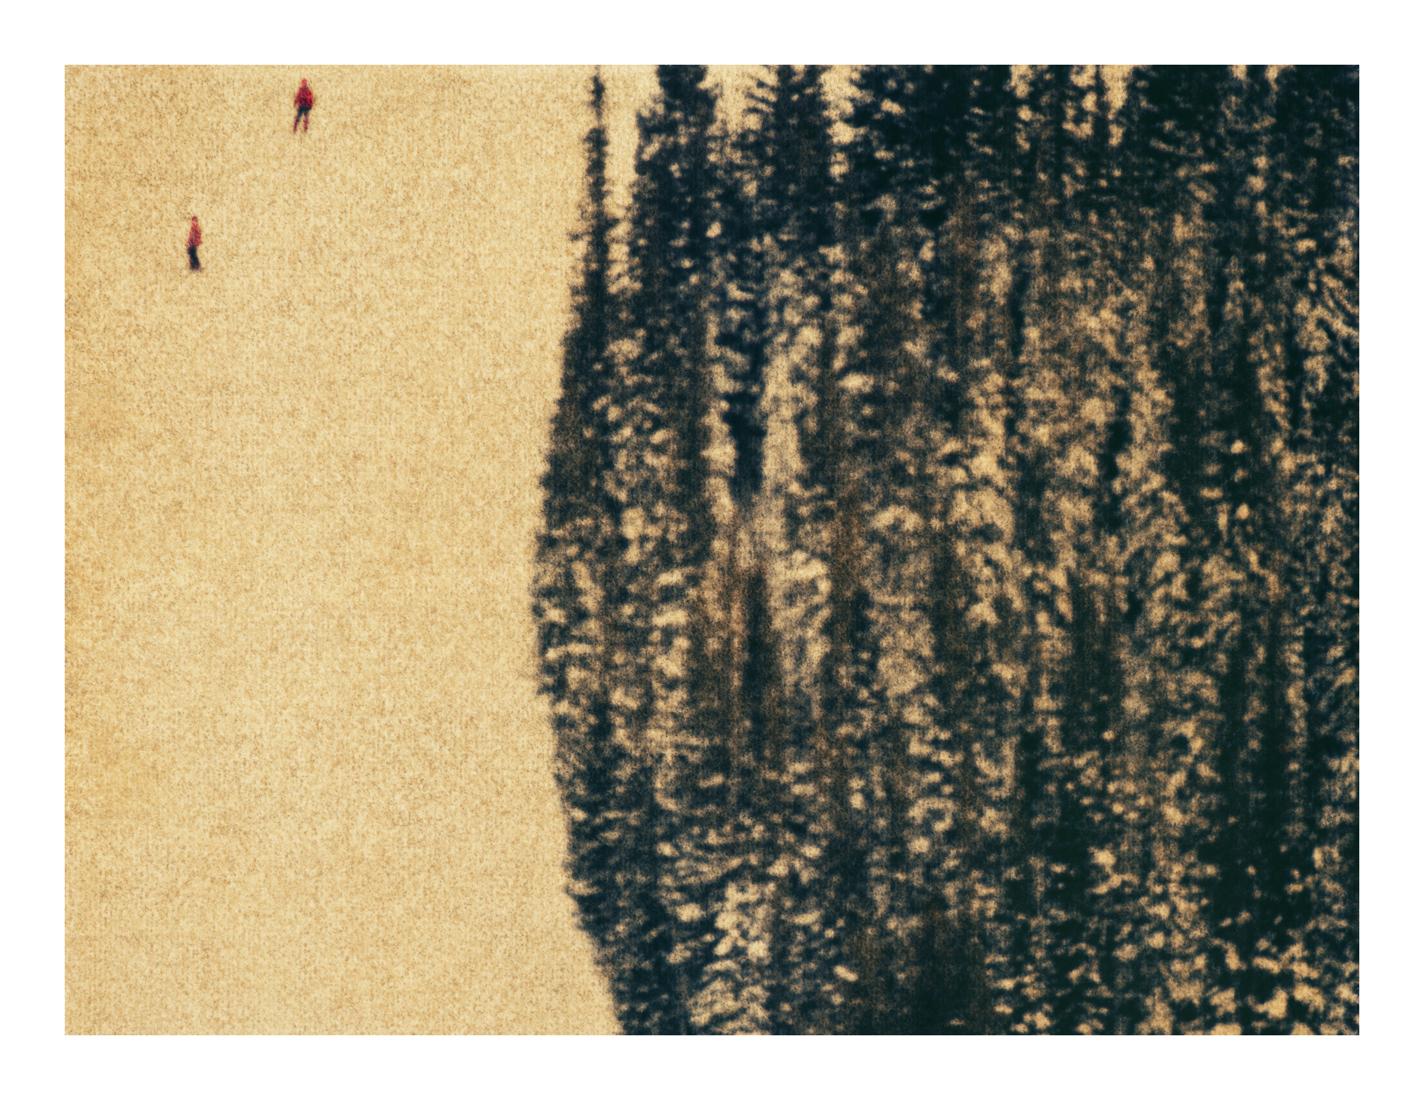 Aspen #14, 2013 (1996)